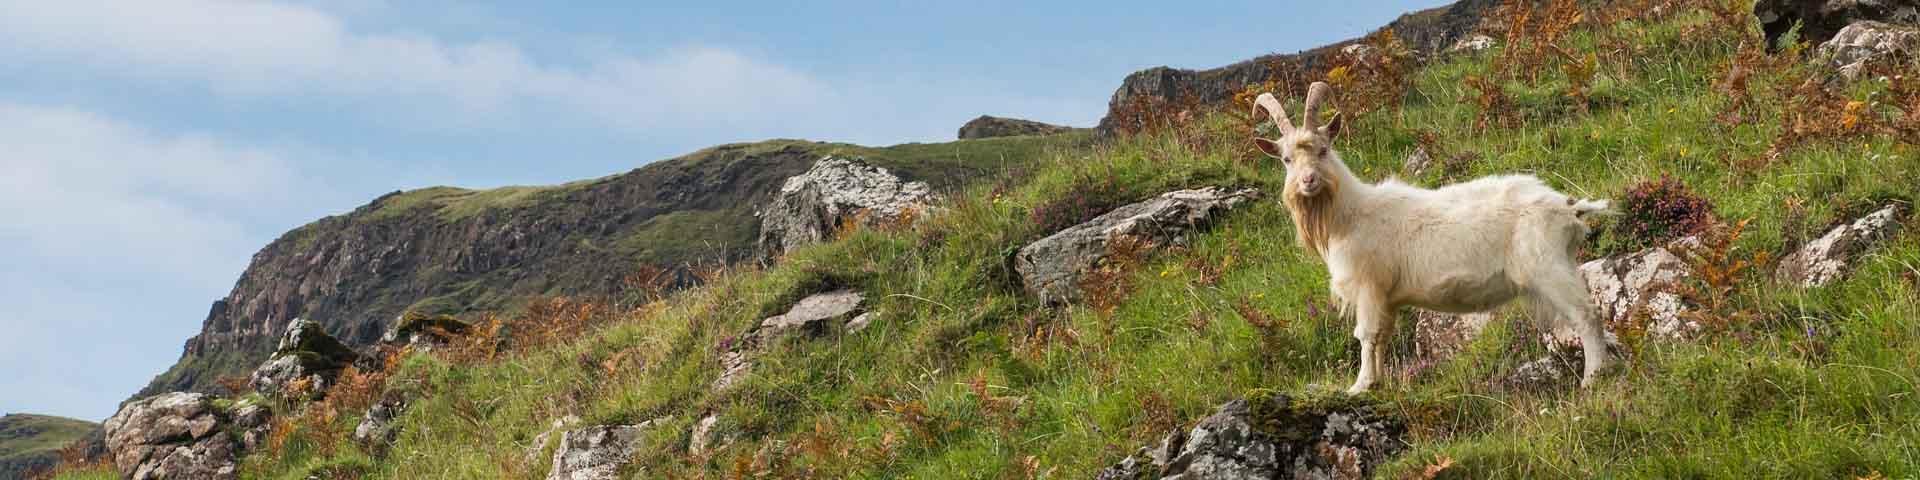 Pennyghael Estate on the Isle of Mull, Scotland